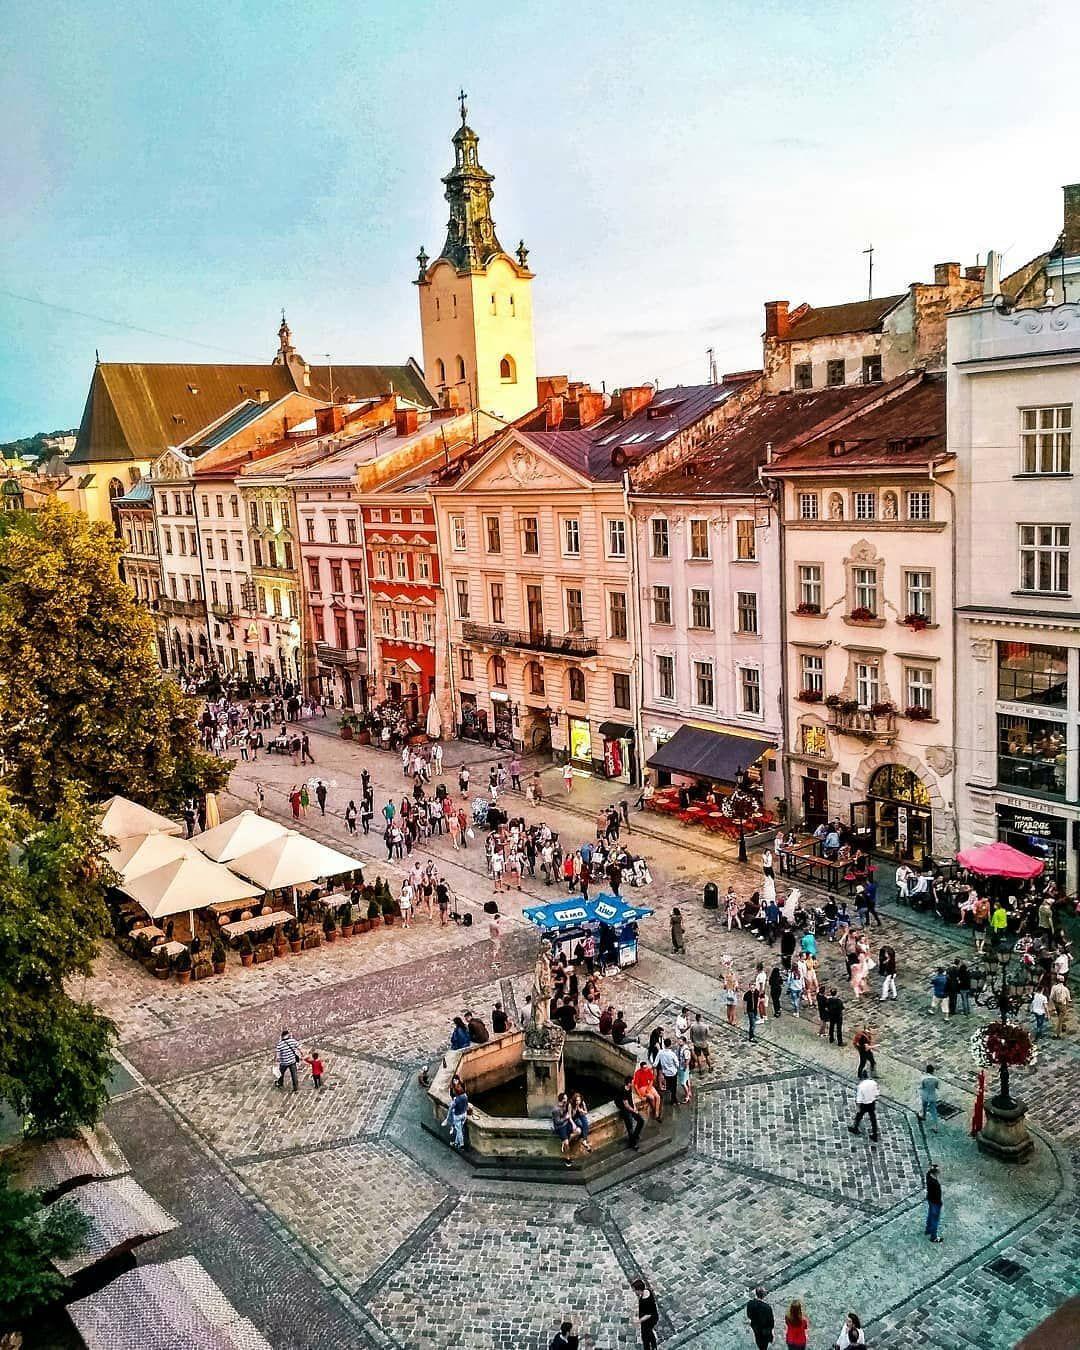 Центральна площа Львова - площа Ринок